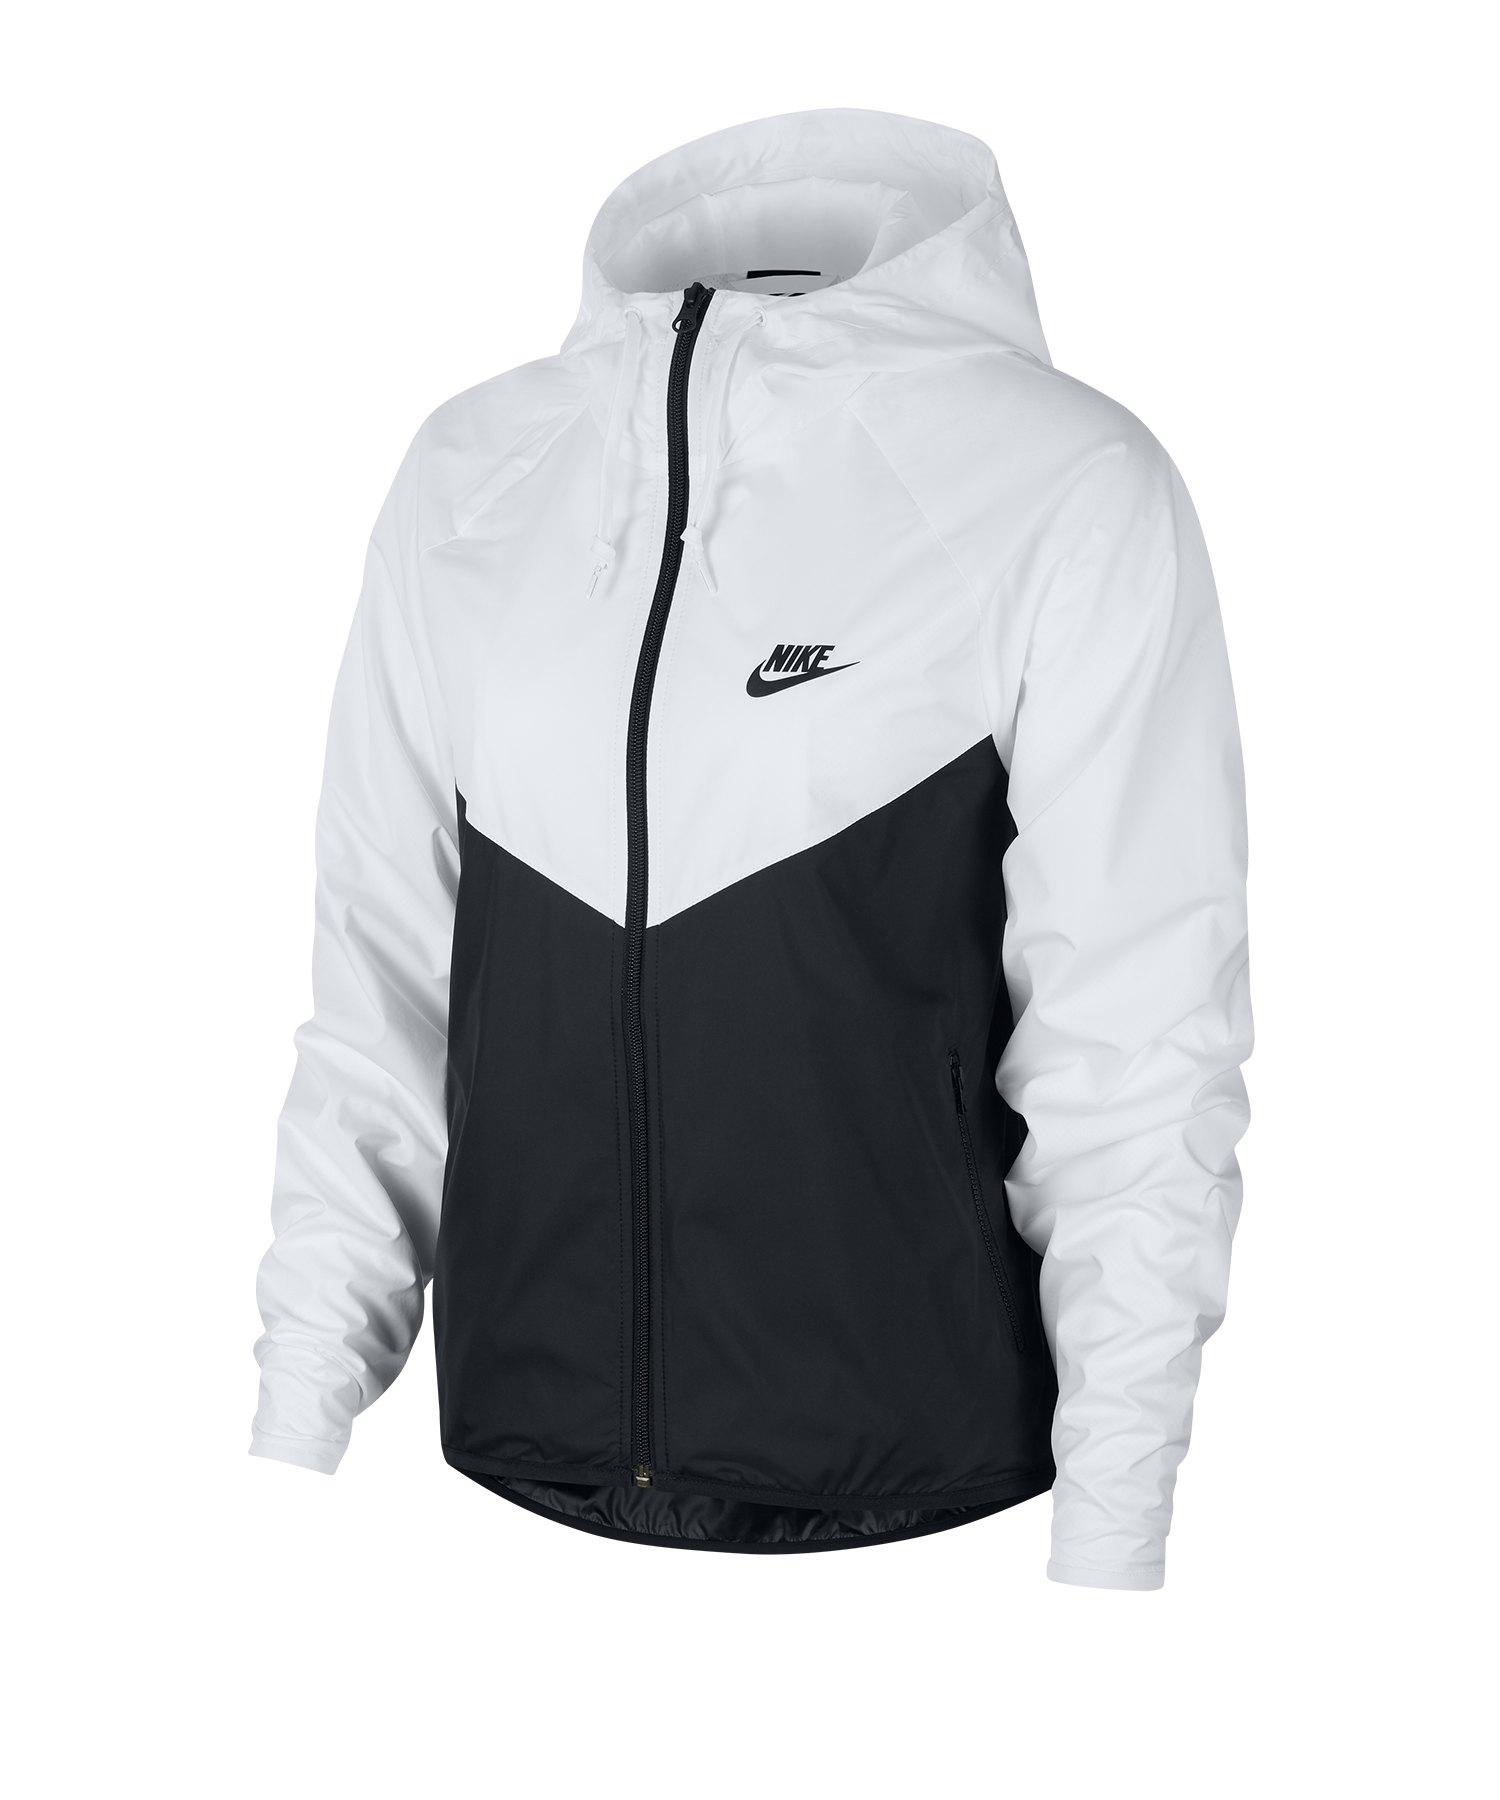 Nike Full-Zip Windrunner Jacke Damen F101 - weiss